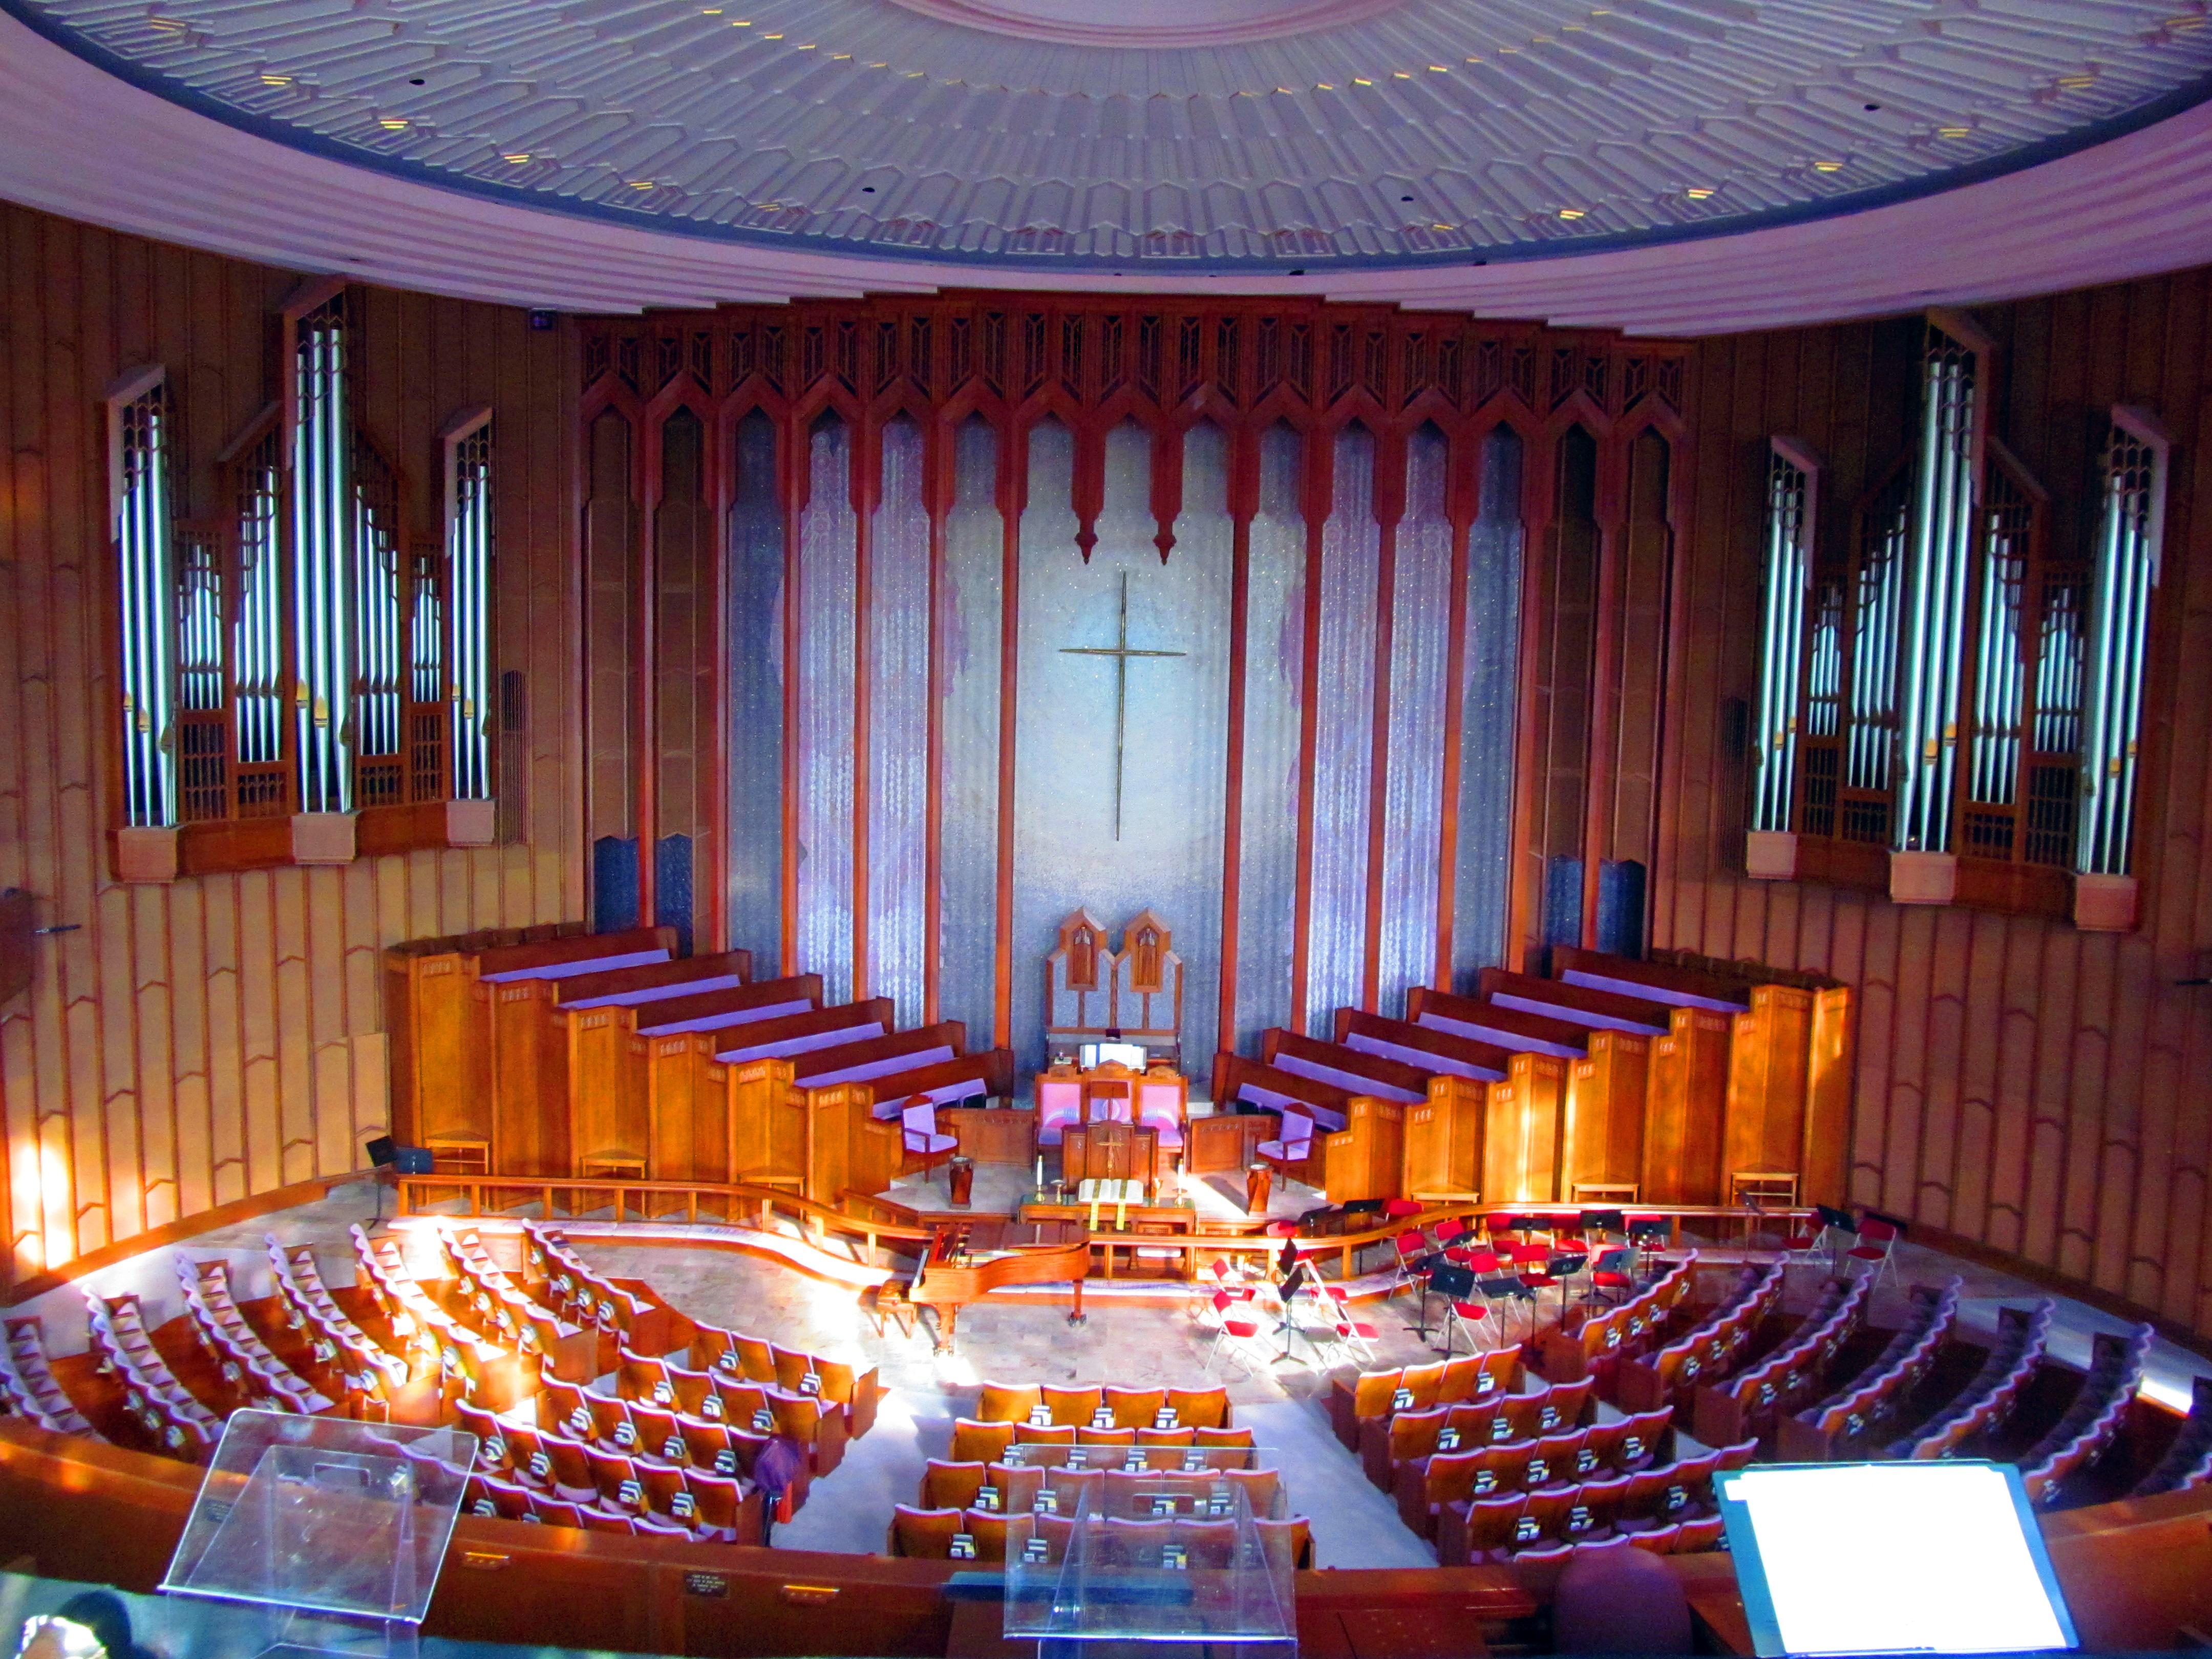 episcopal from balcony methodist interior wiki file design boston sanctuary tulsa ok church avenue jpg